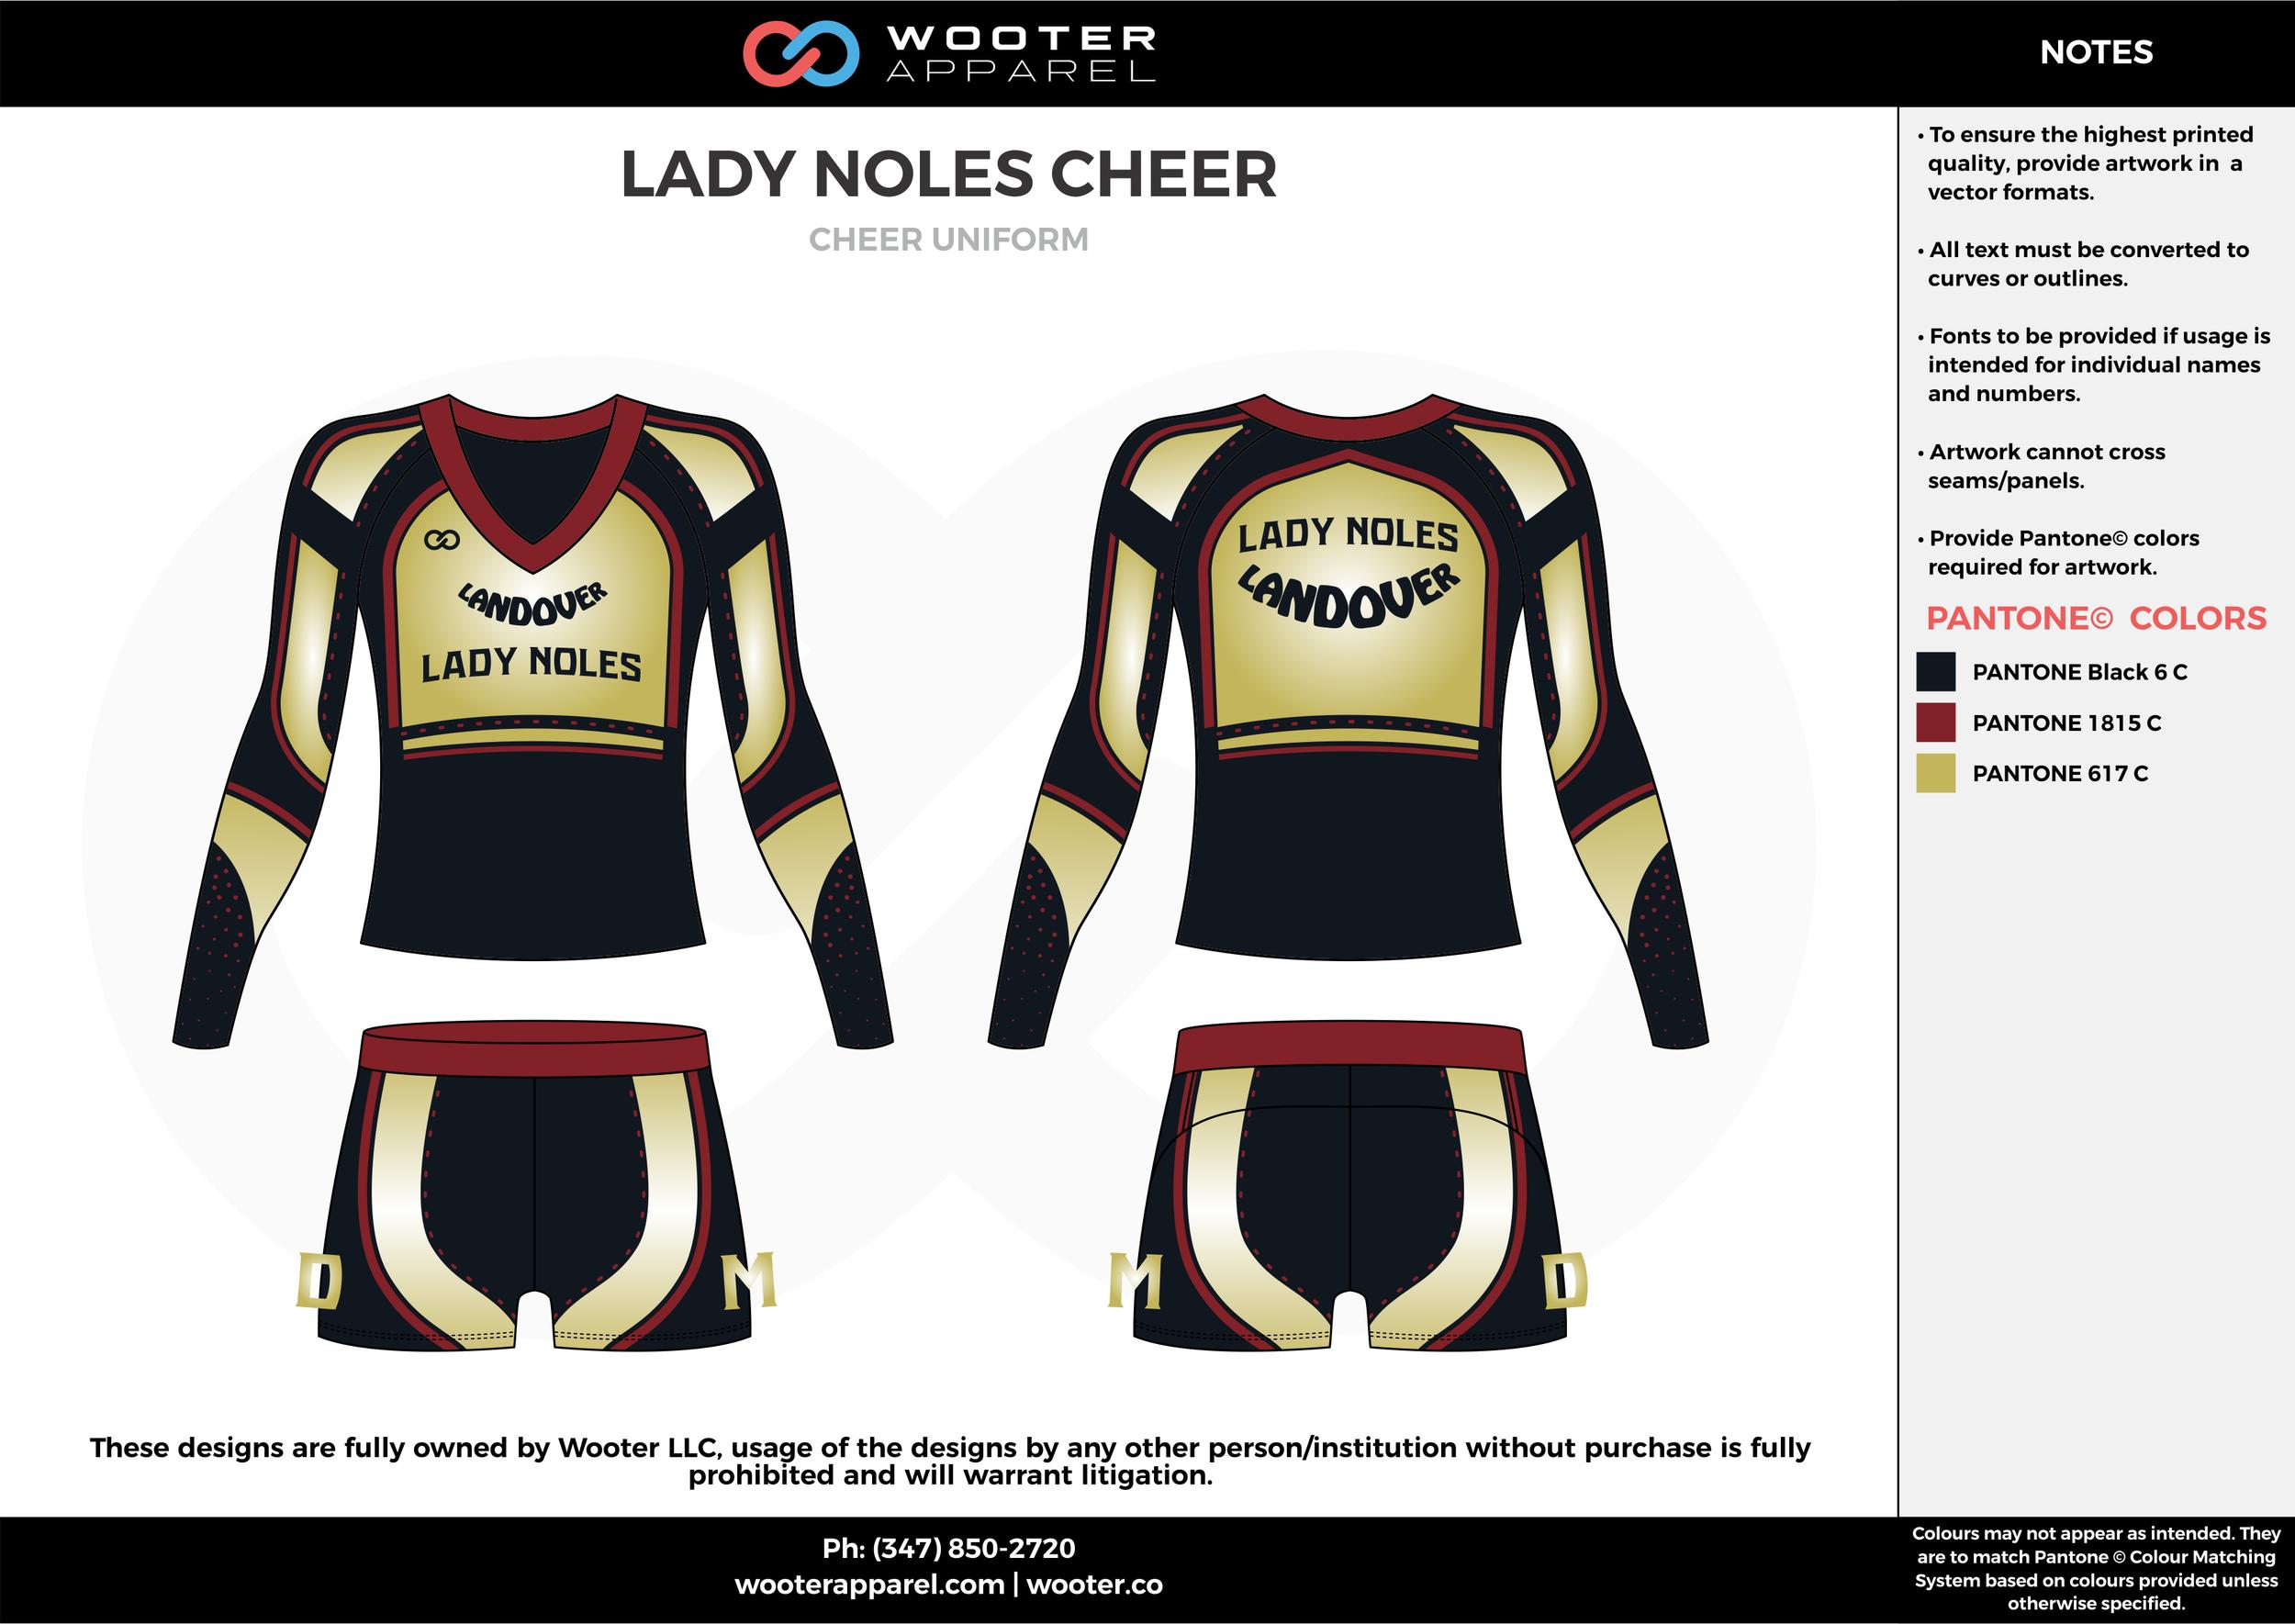 LADY NOLES CHEER black maroon gold cheerleading uniforms, top, and shorts